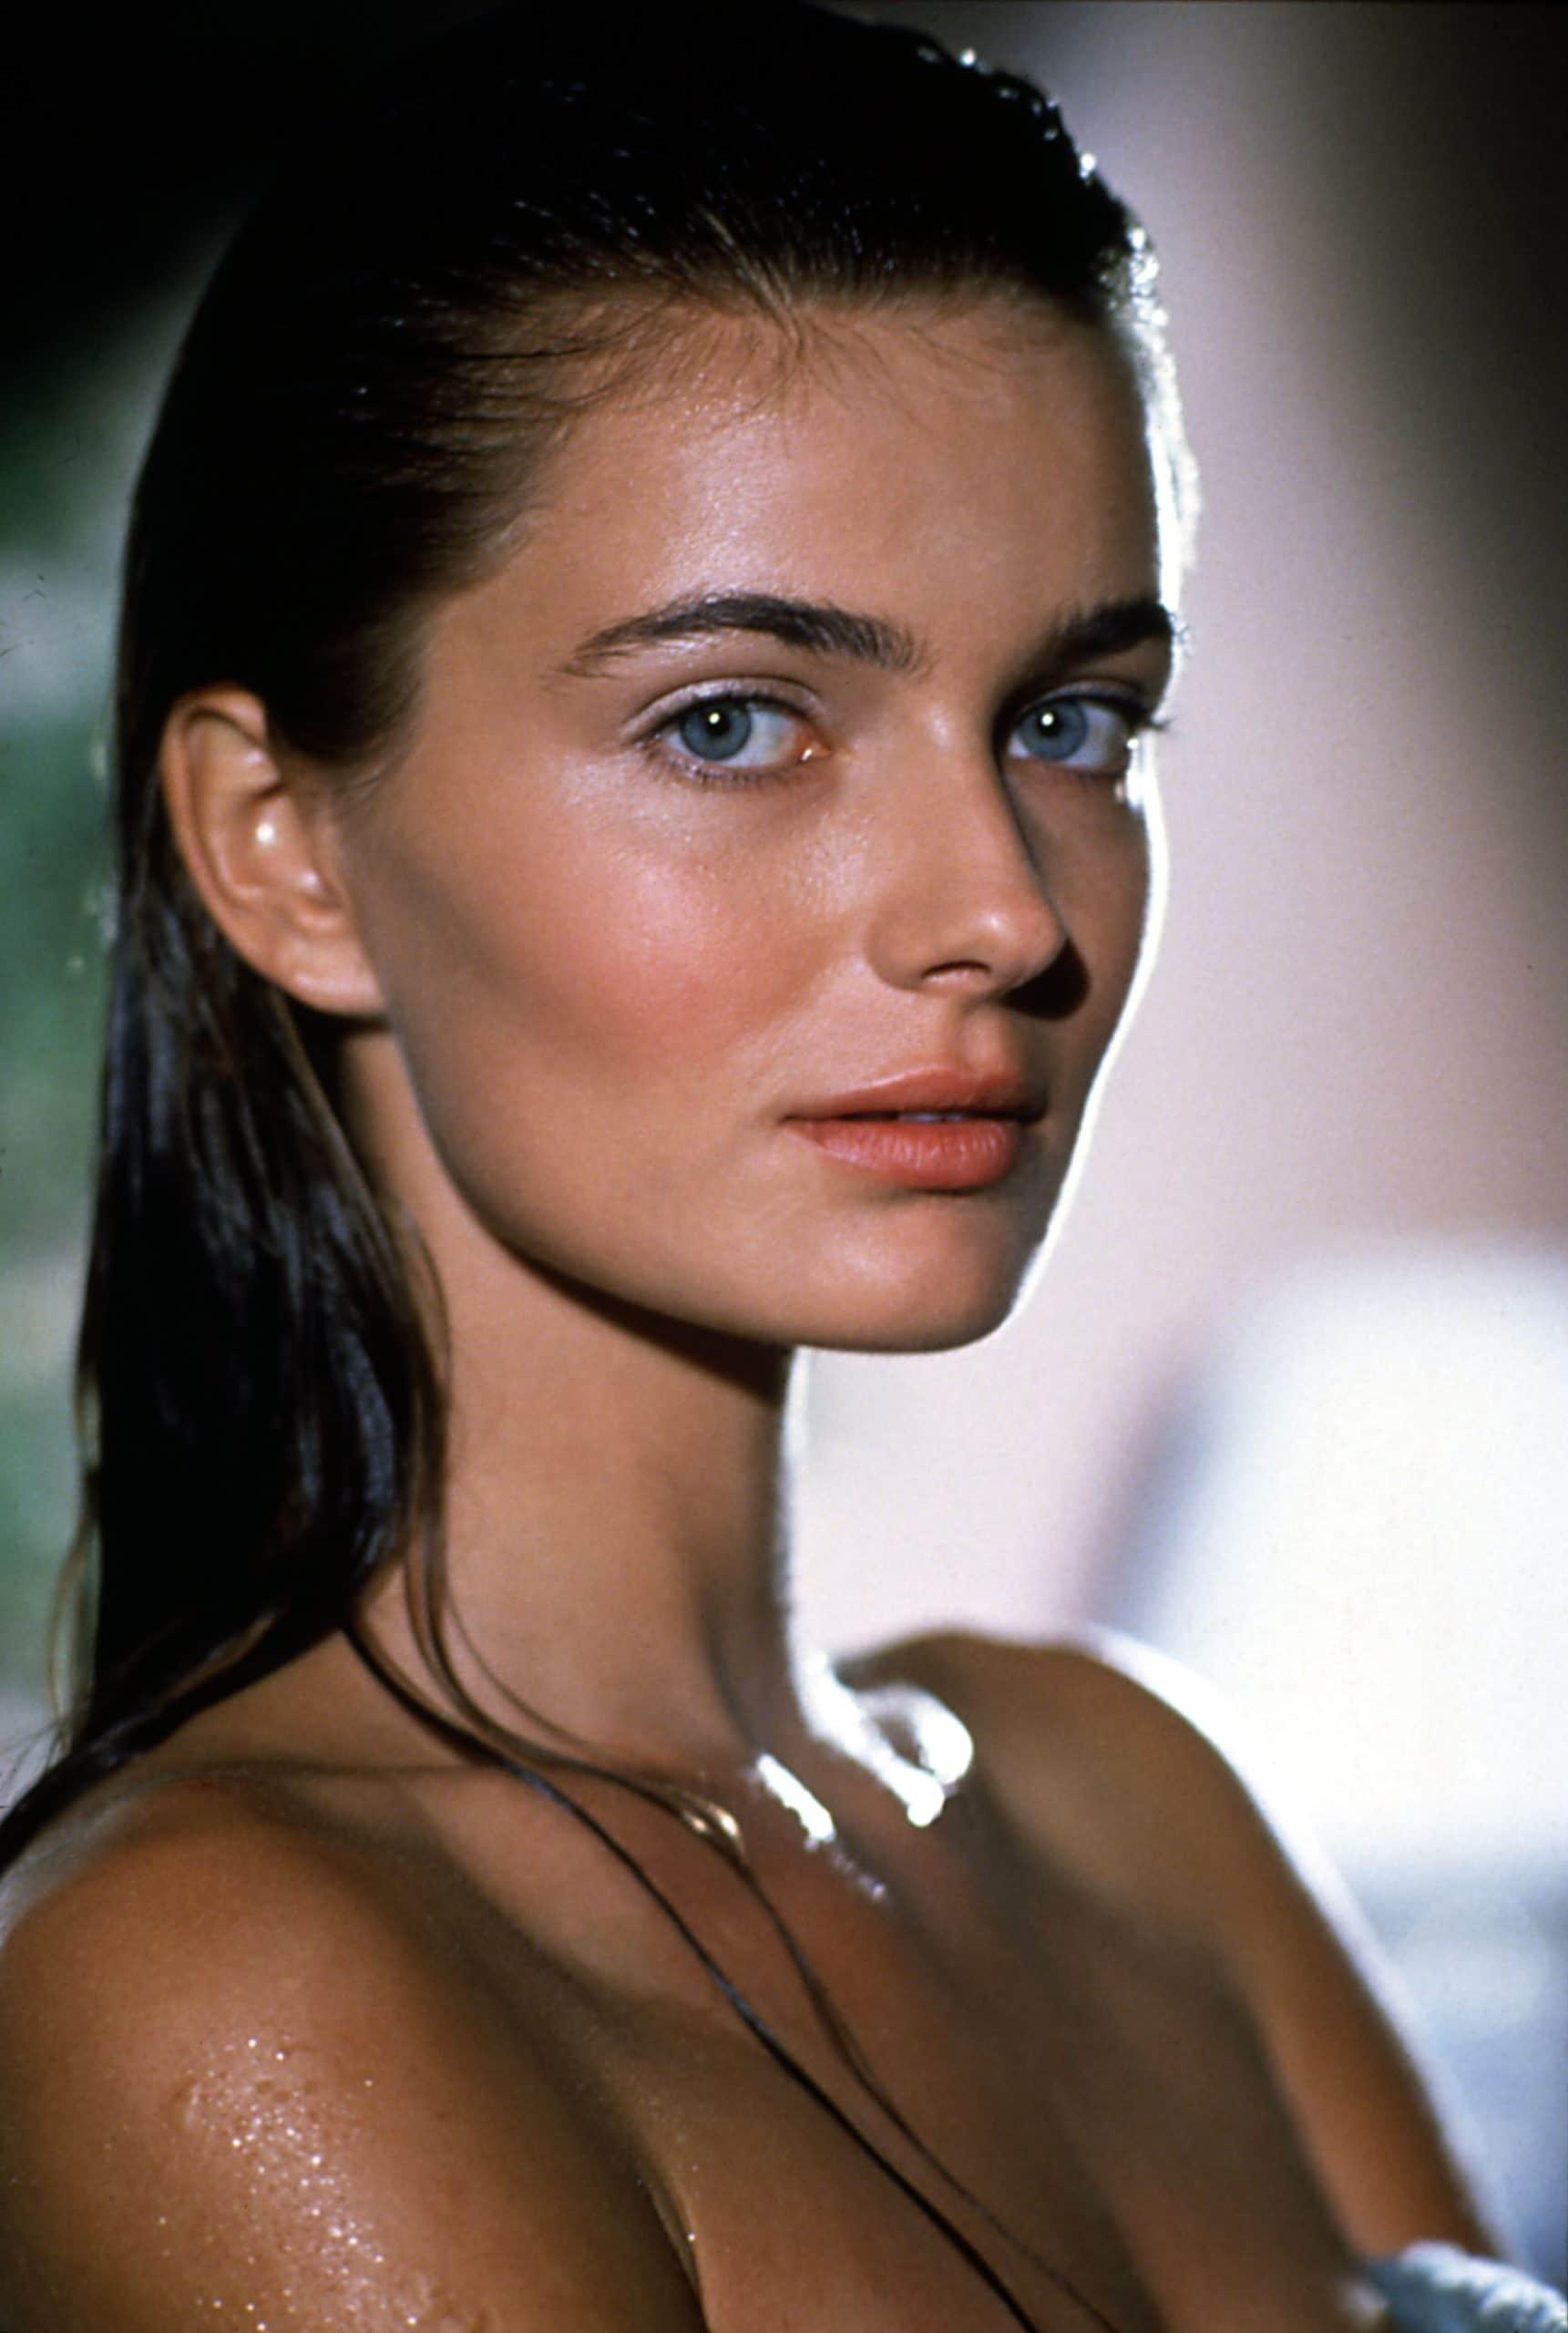 HER ALIBI, Paulina Porizkova, 1989